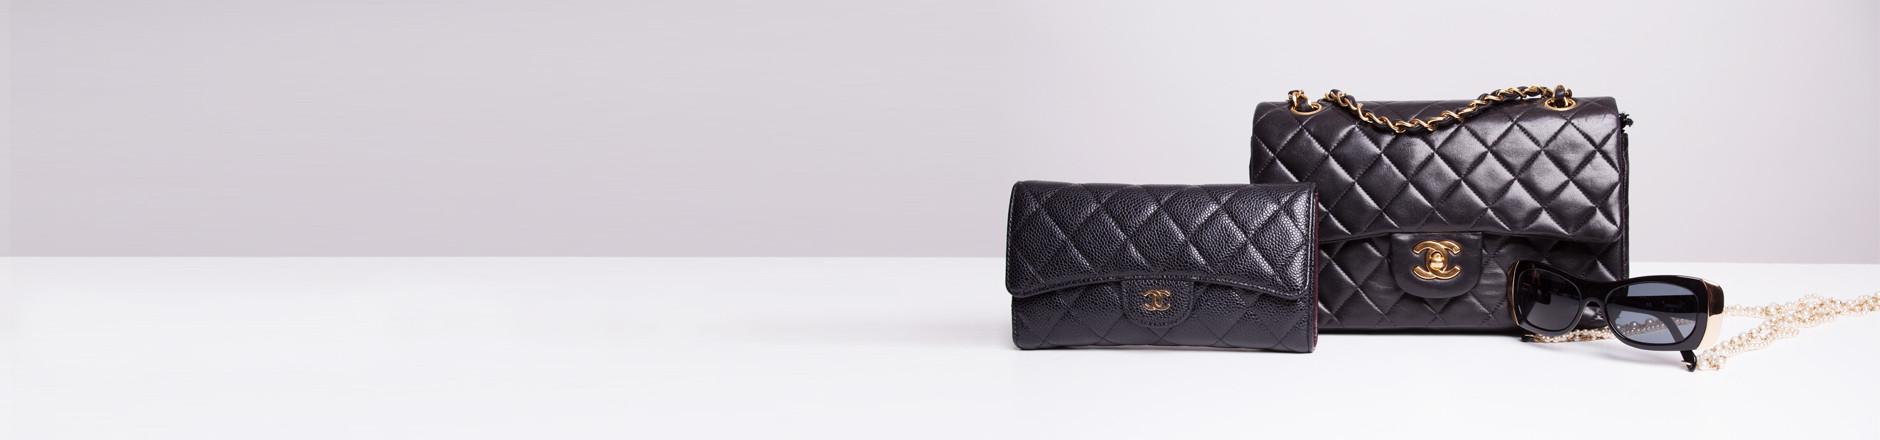 Second Hand Chanel Handbags Uk